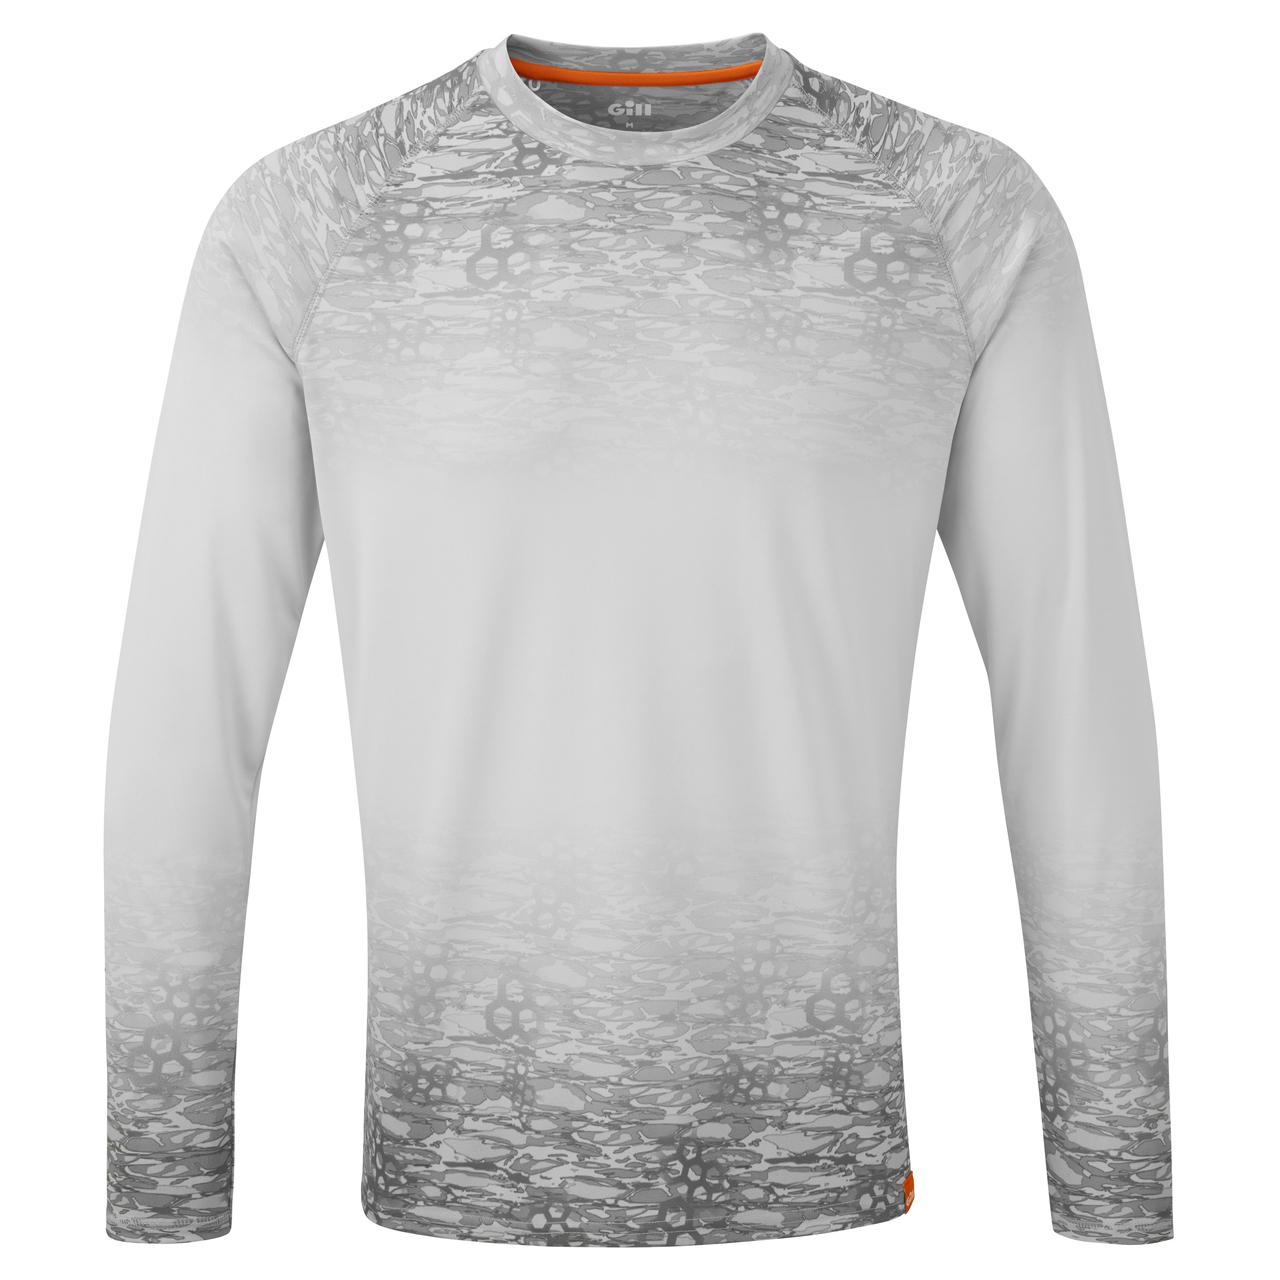 Men's UV Tec Tee - Long Sleeve - UV011-ICE01-1.jpg